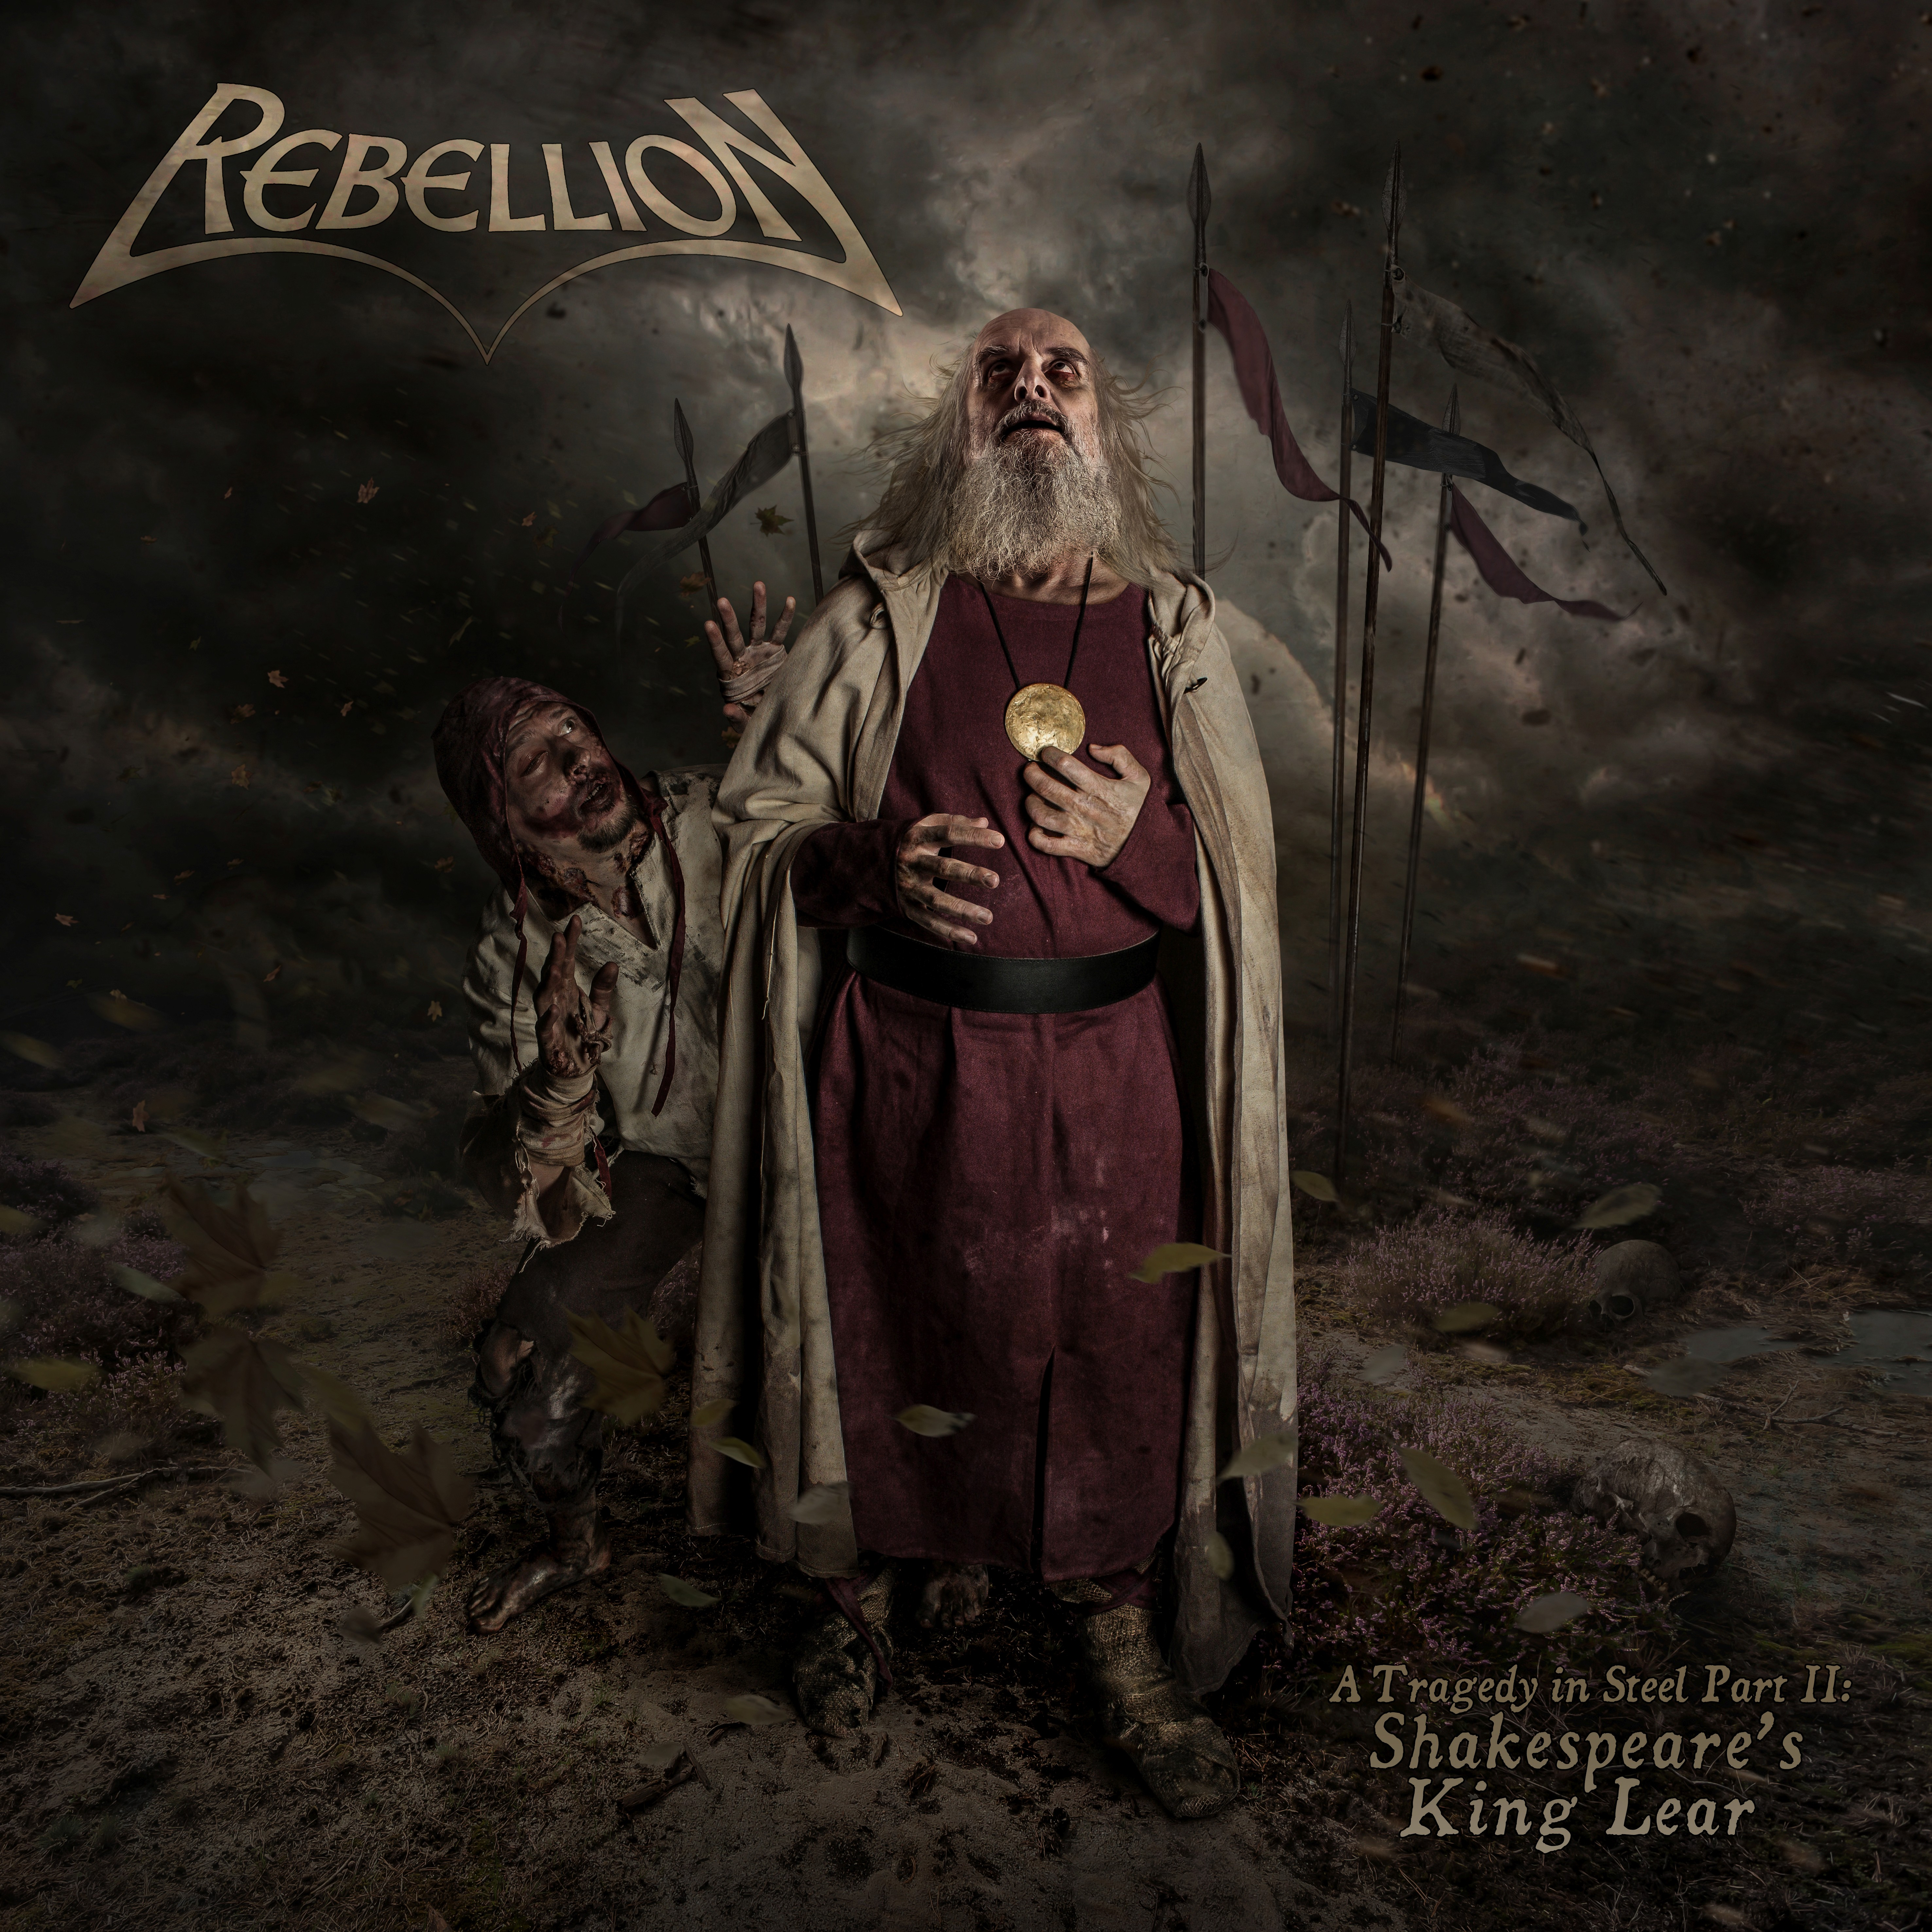 Rebellion-ATragedyInSteelPartII-ShakespearesKingLear-Frontcover-Logo-Titel-5000x5000px-RGB